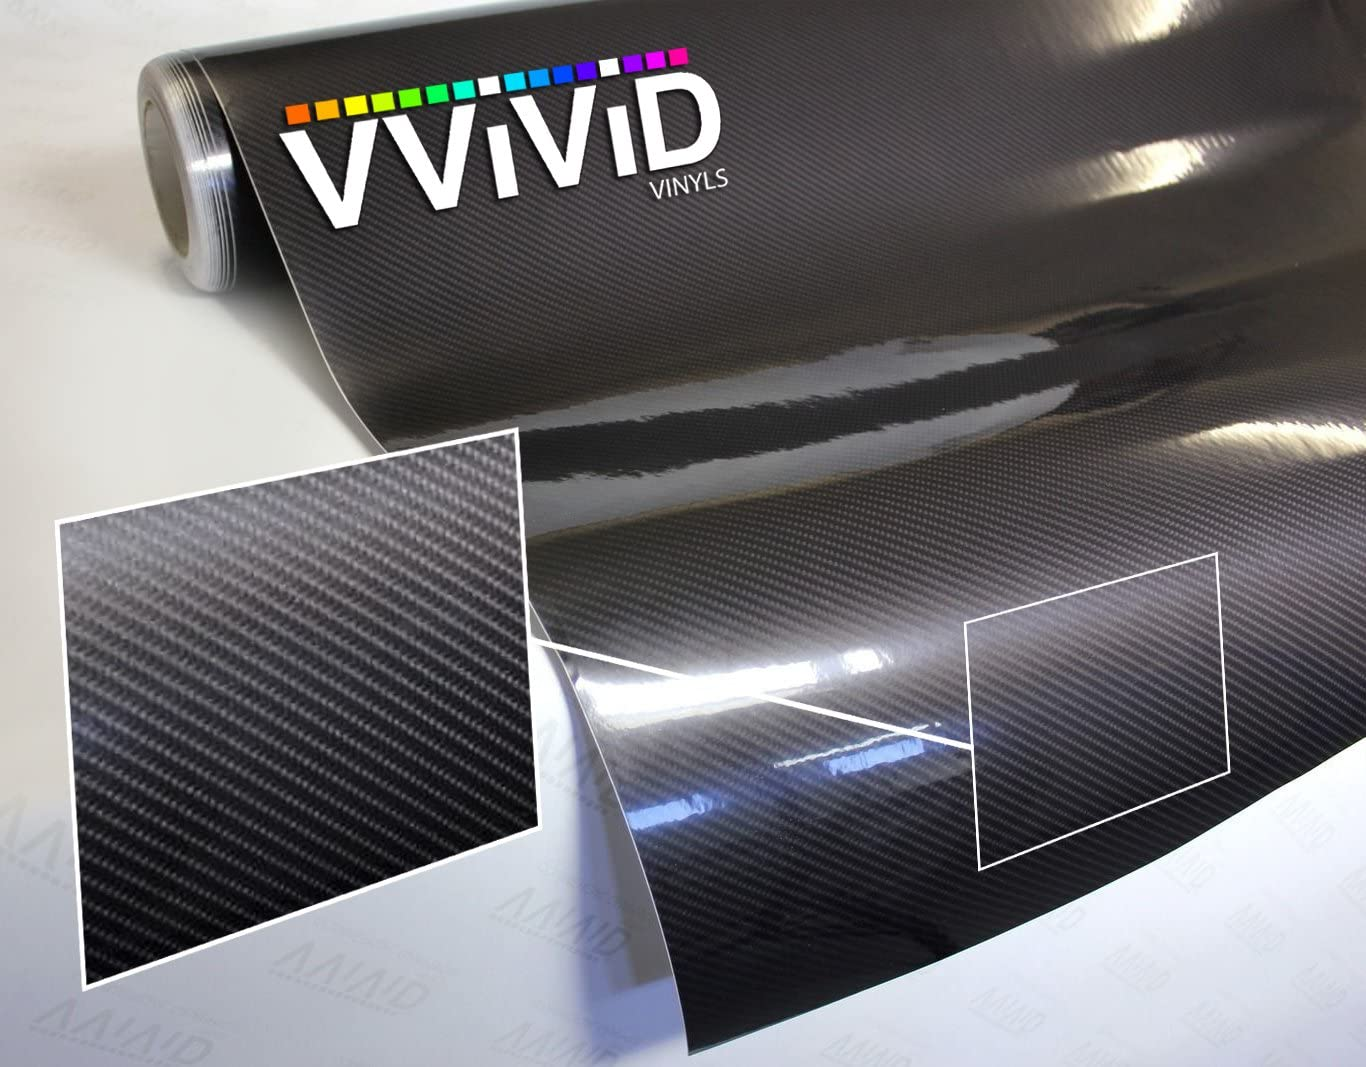 XPO Black High Gloss Carbon Fibre Tech Art 3D Cast Vinyl DIY Wrap 10ft x 5ft